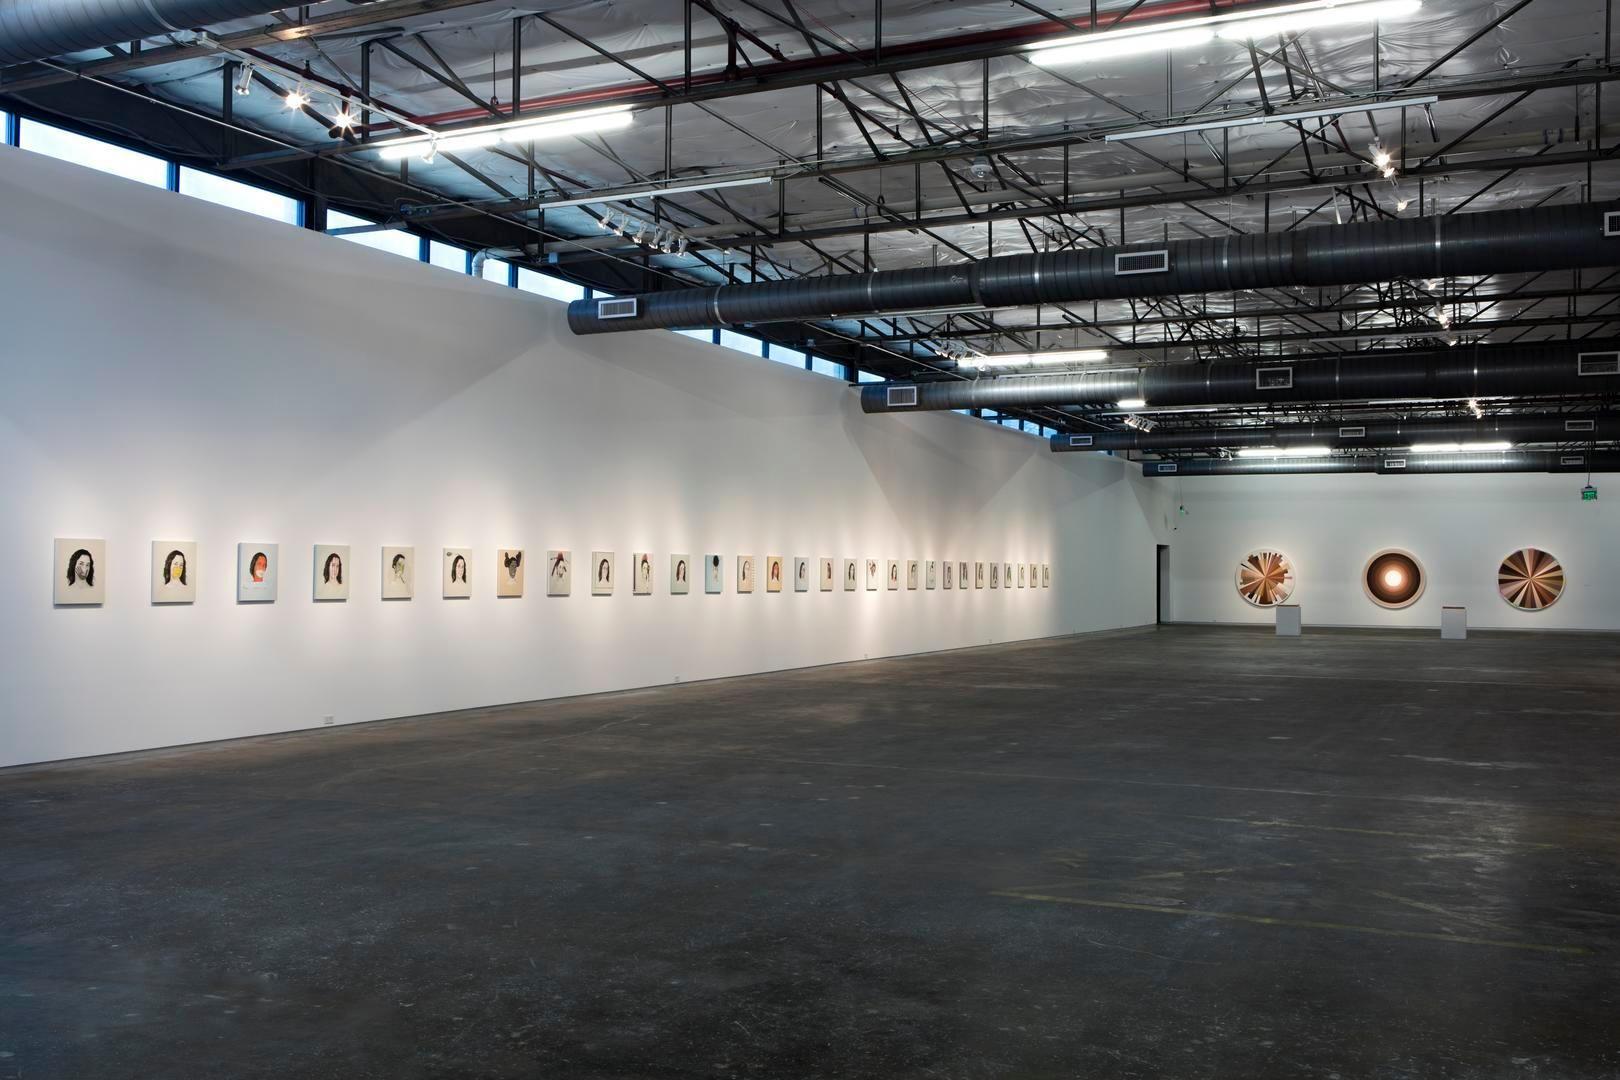 images?q=tbn:ANd9GcQh_l3eQ5xwiPy07kGEXjmjgmBKBRB7H2mRxCGhv1tFWg5c_mWT Awesome Contemporary Art Museum Dallas @koolgadgetz.com.info